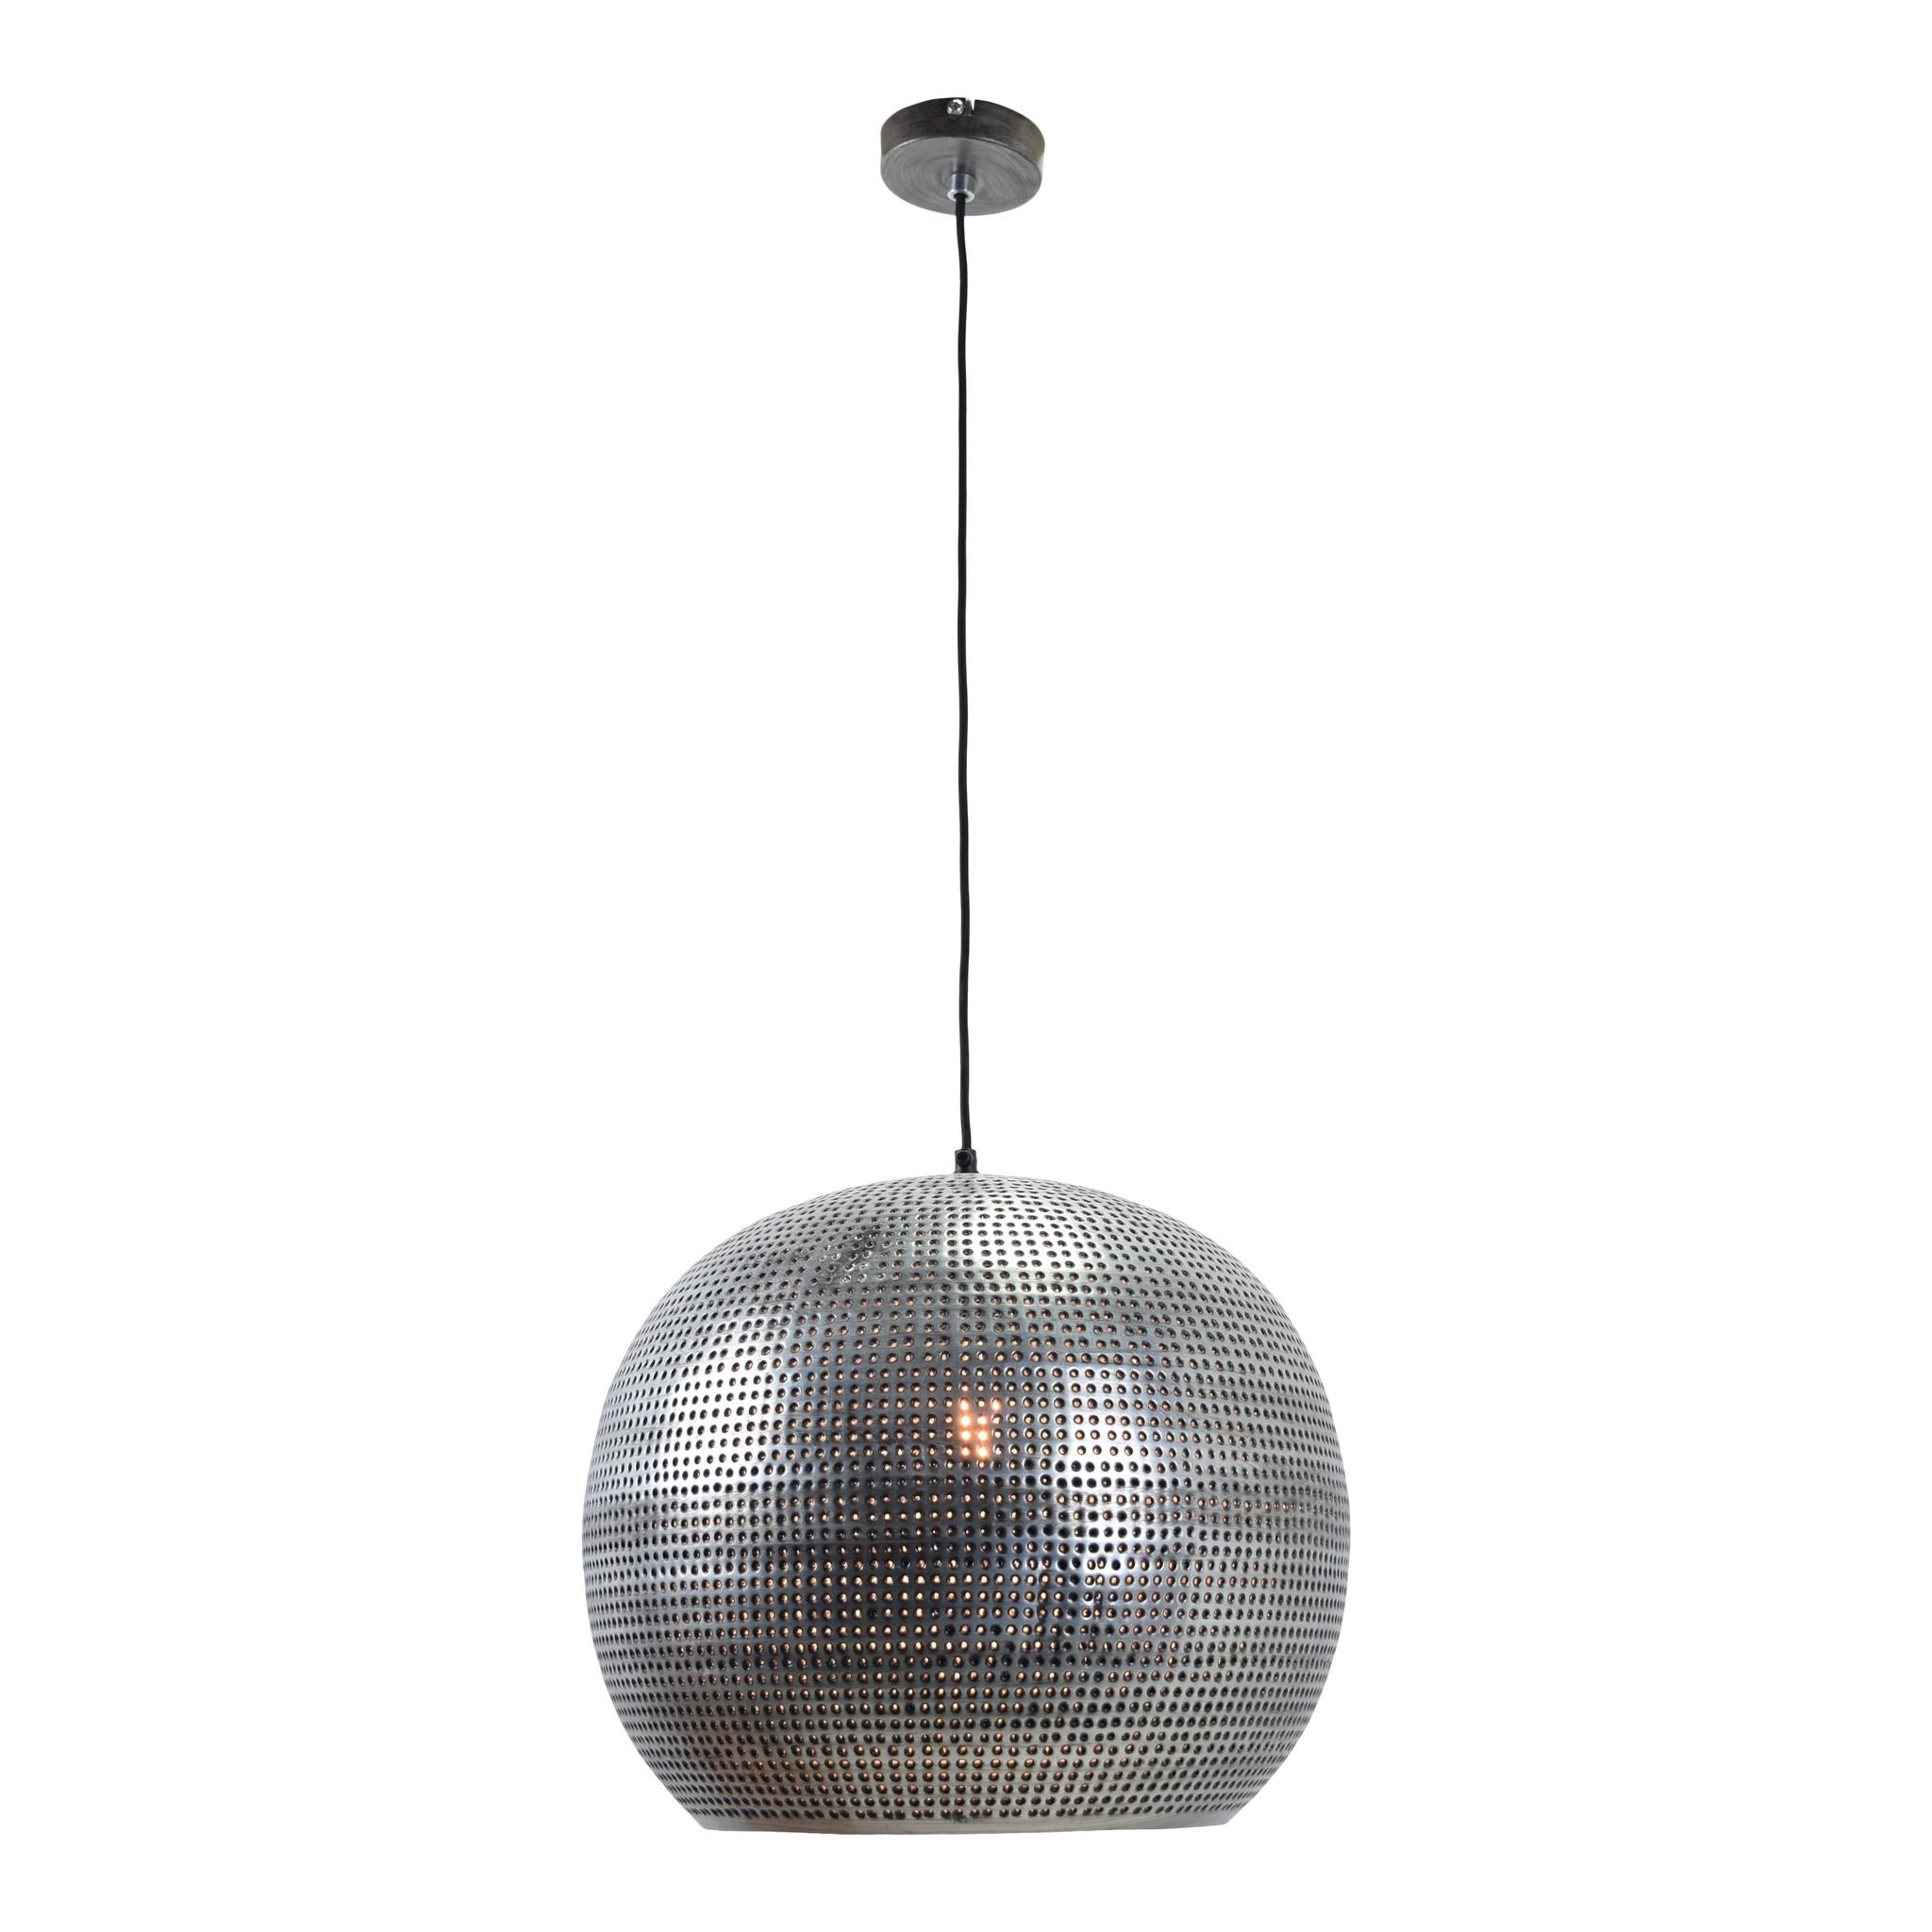 Urban Interiors Hanglamp Spike bol XL Ø 40 cm Zink